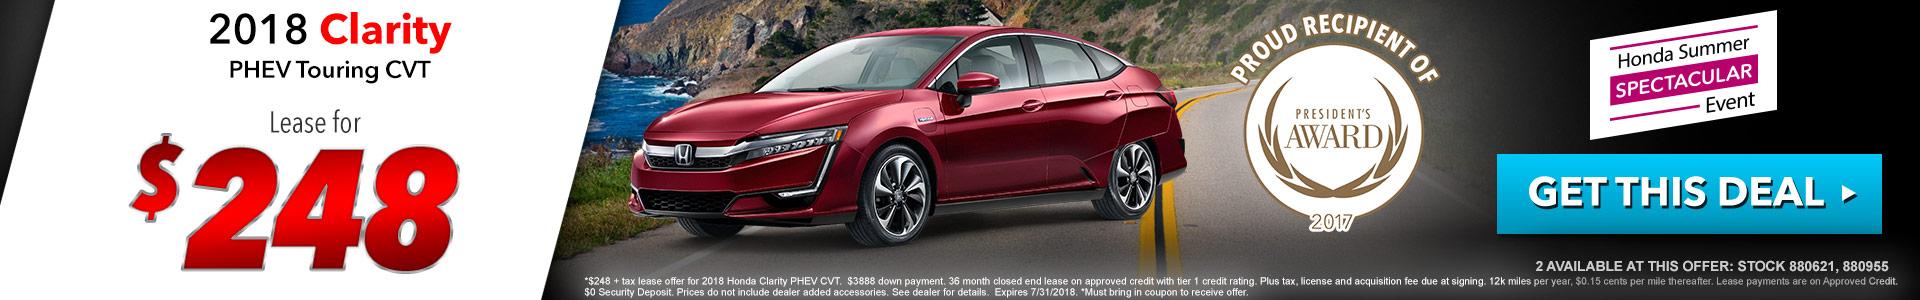 Honda Clarity $248 Lease